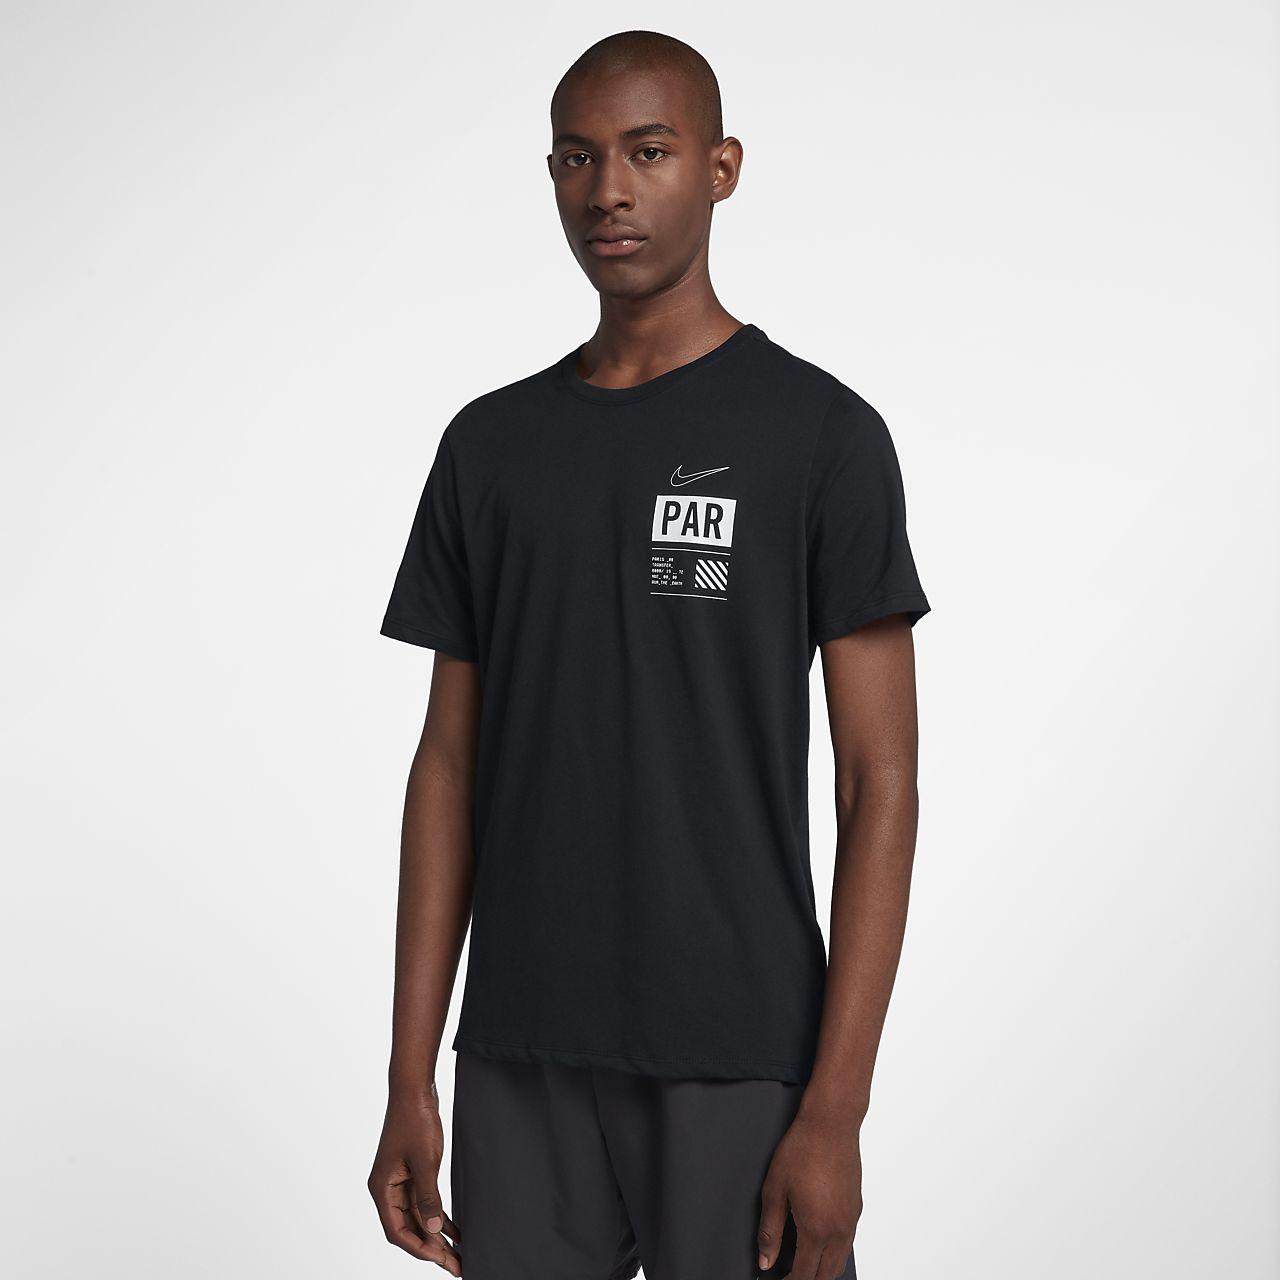 82e50944aef8 Nike Dri-FIT (Paris) Men s Running T-Shirt. Nike.com AU